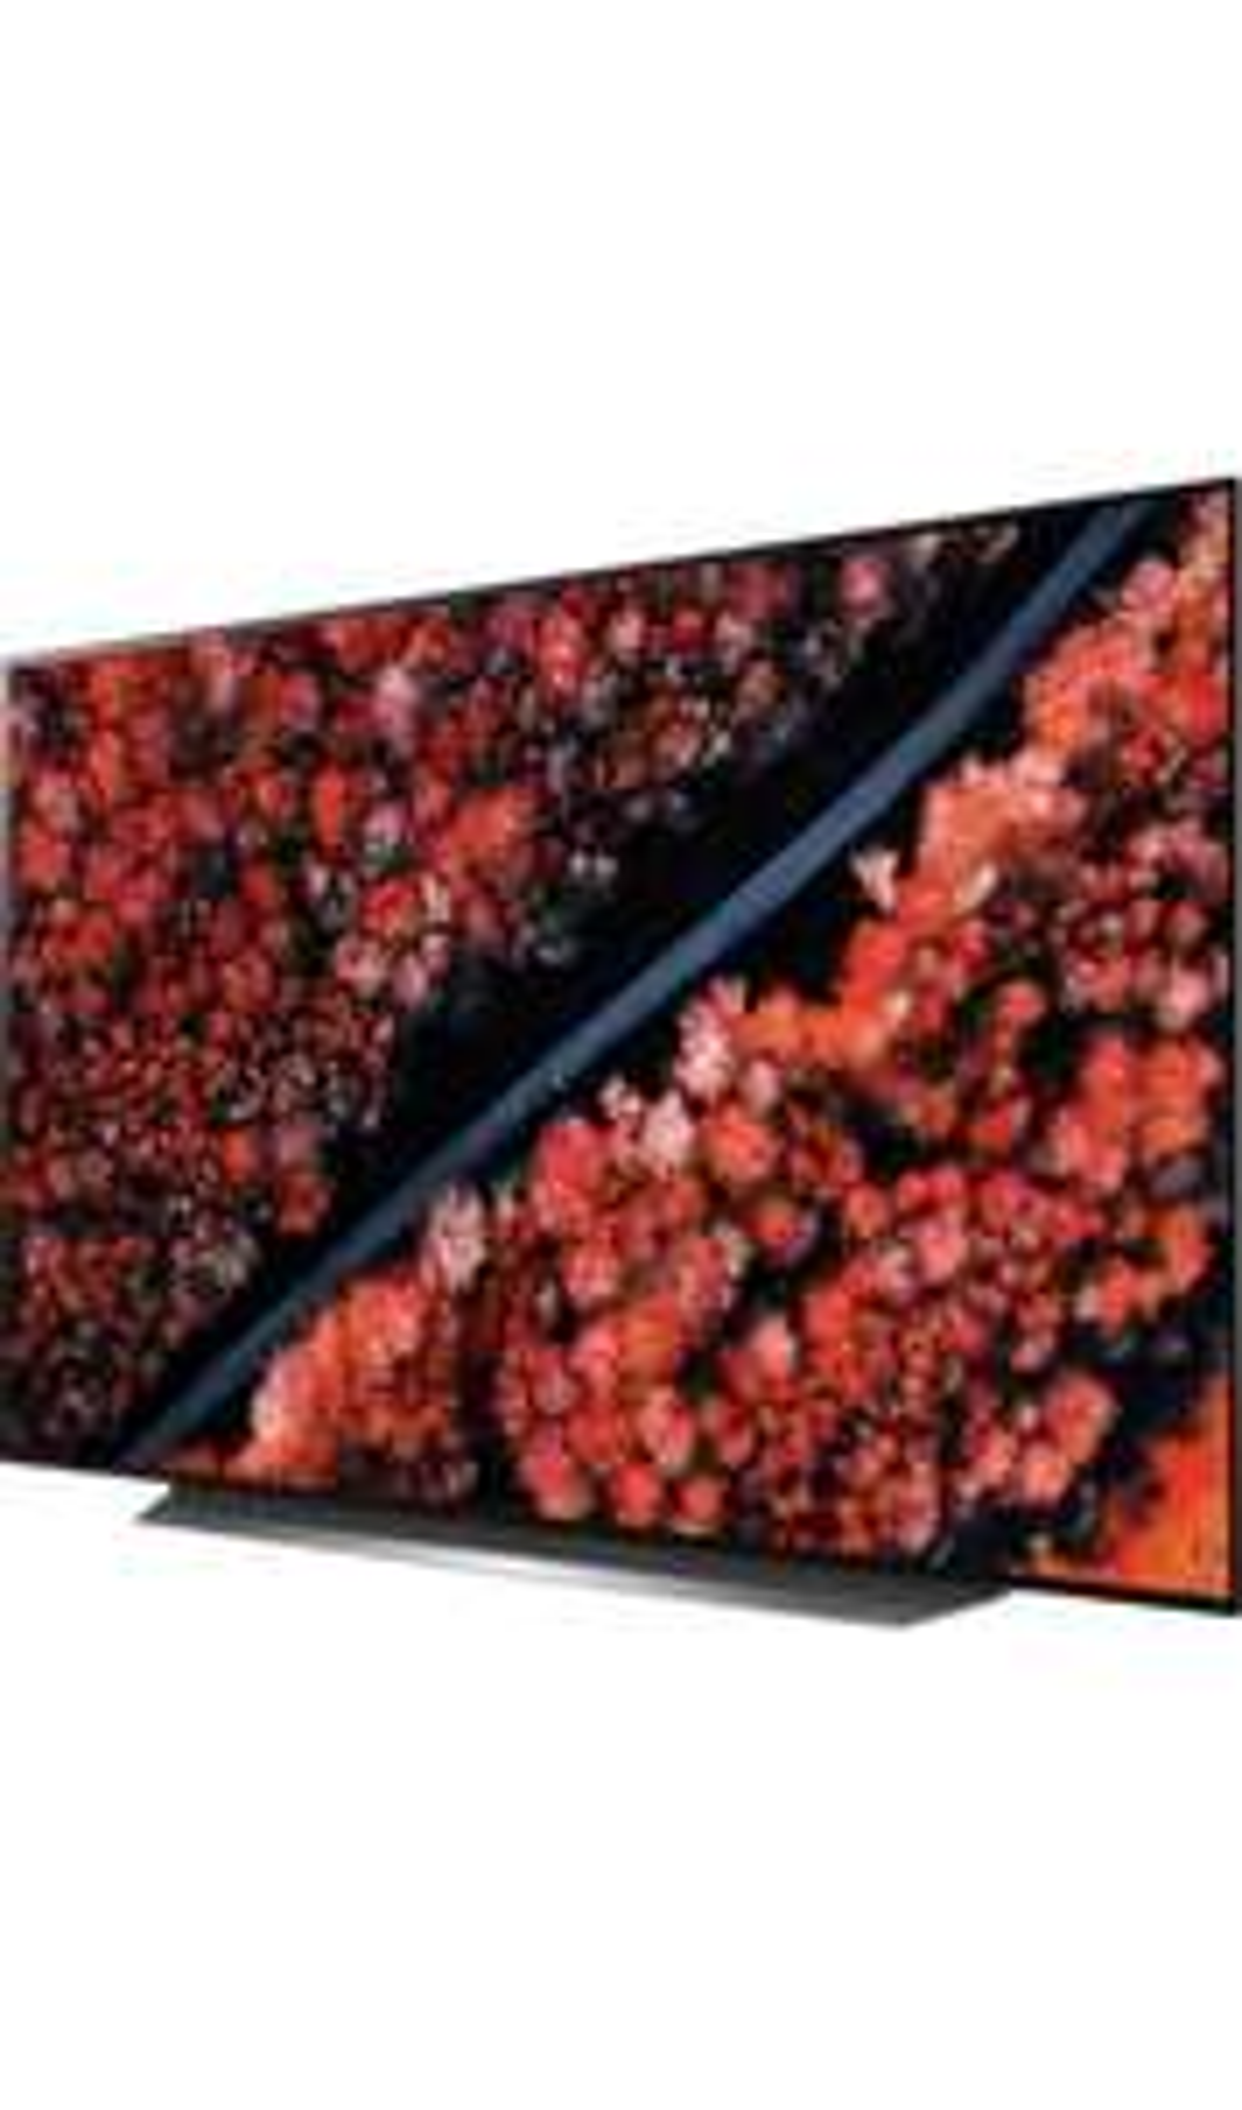 "TV 65"" LG OLED65C9 - 4K UHD, OLED, Smart TV"